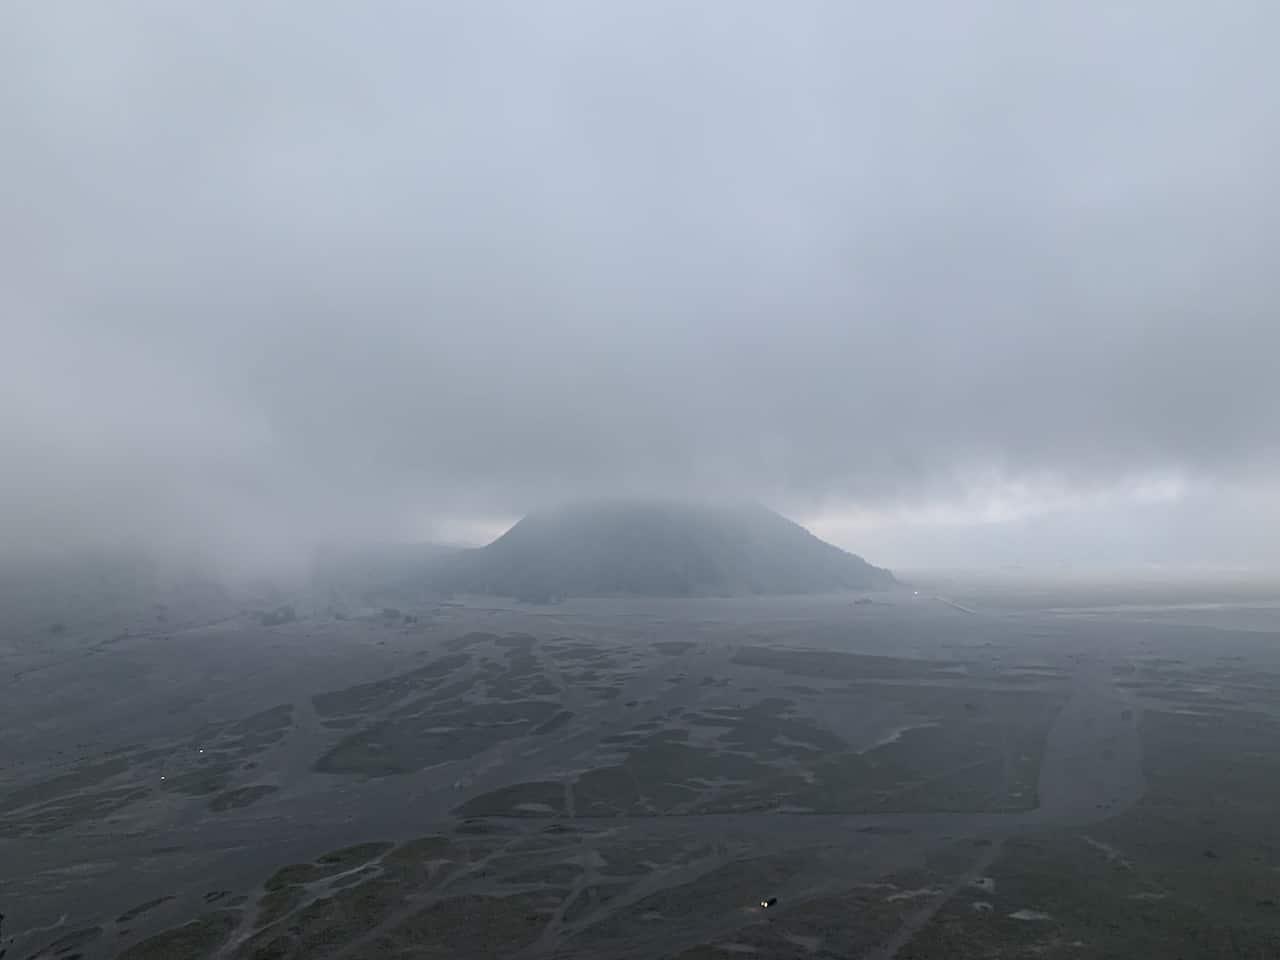 Bromo Tengger Semeru National Park Clouds